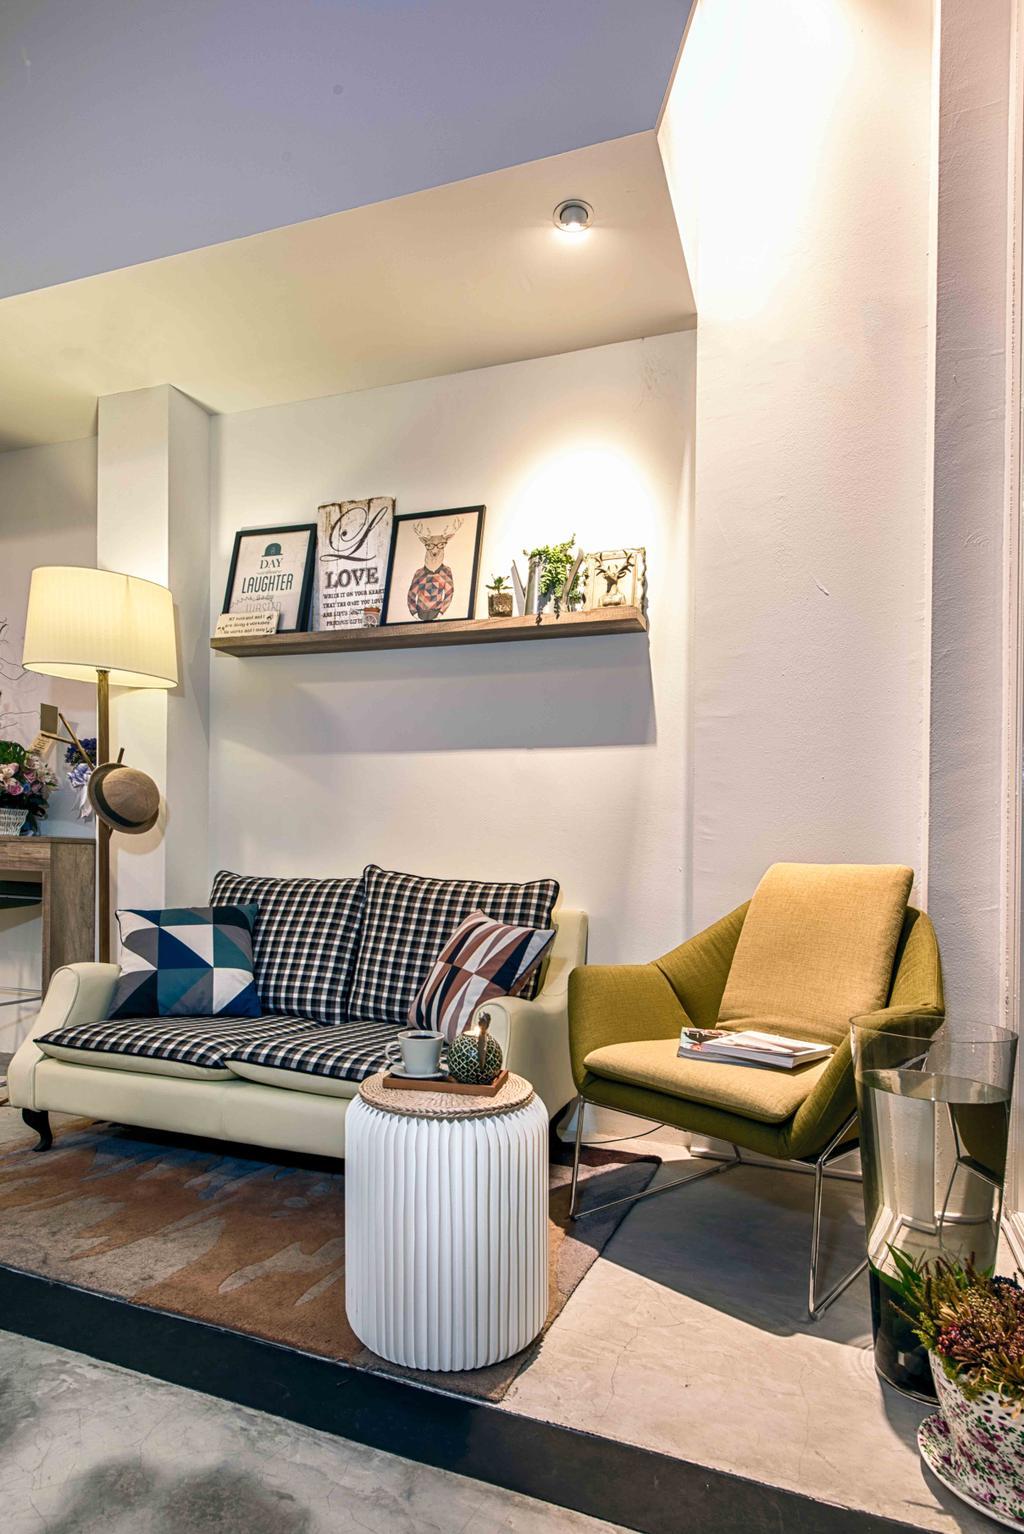 Salon, Commercial, Interior Designer, Mr Shopper Studio, Eclectic, Scandinavian, Retro, Couch, Furniture, Flora, Jar, Plant, Potted Plant, Pottery, Vase, Chair, Lamp, Art